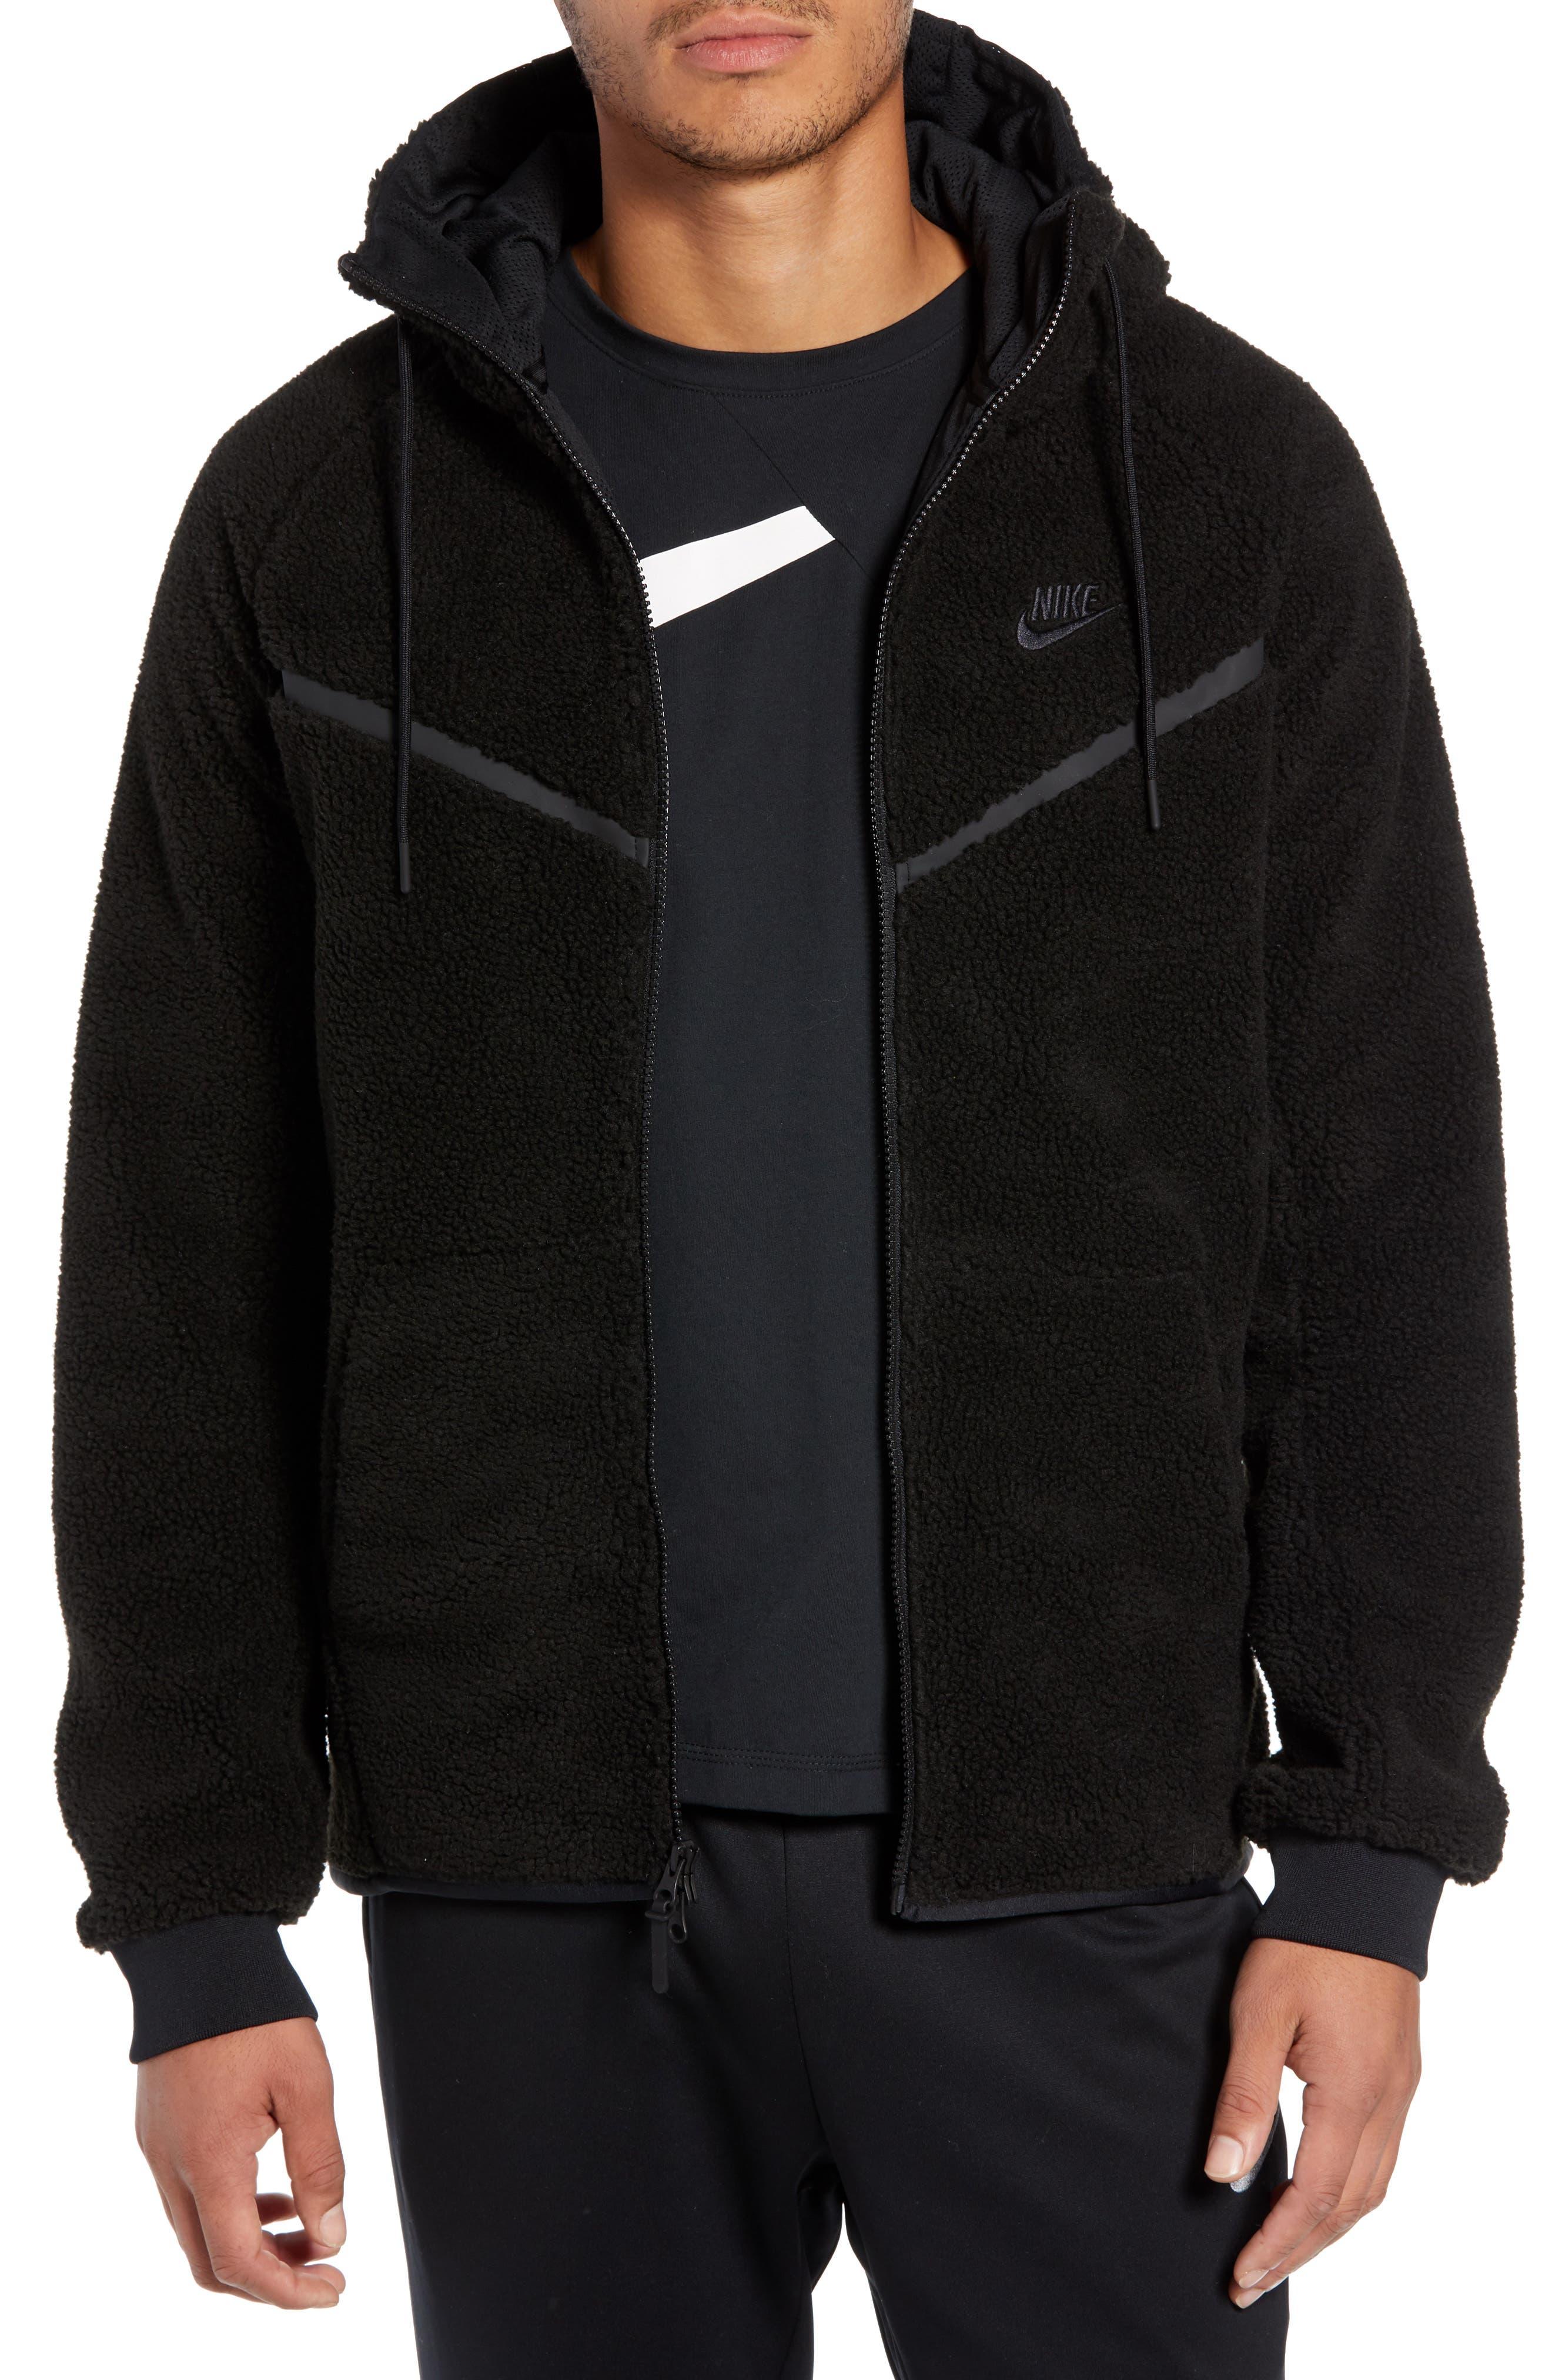 NIKE, Tech Icon Fleece Zip Hoodie, Main thumbnail 1, color, BLACK/ BLACK